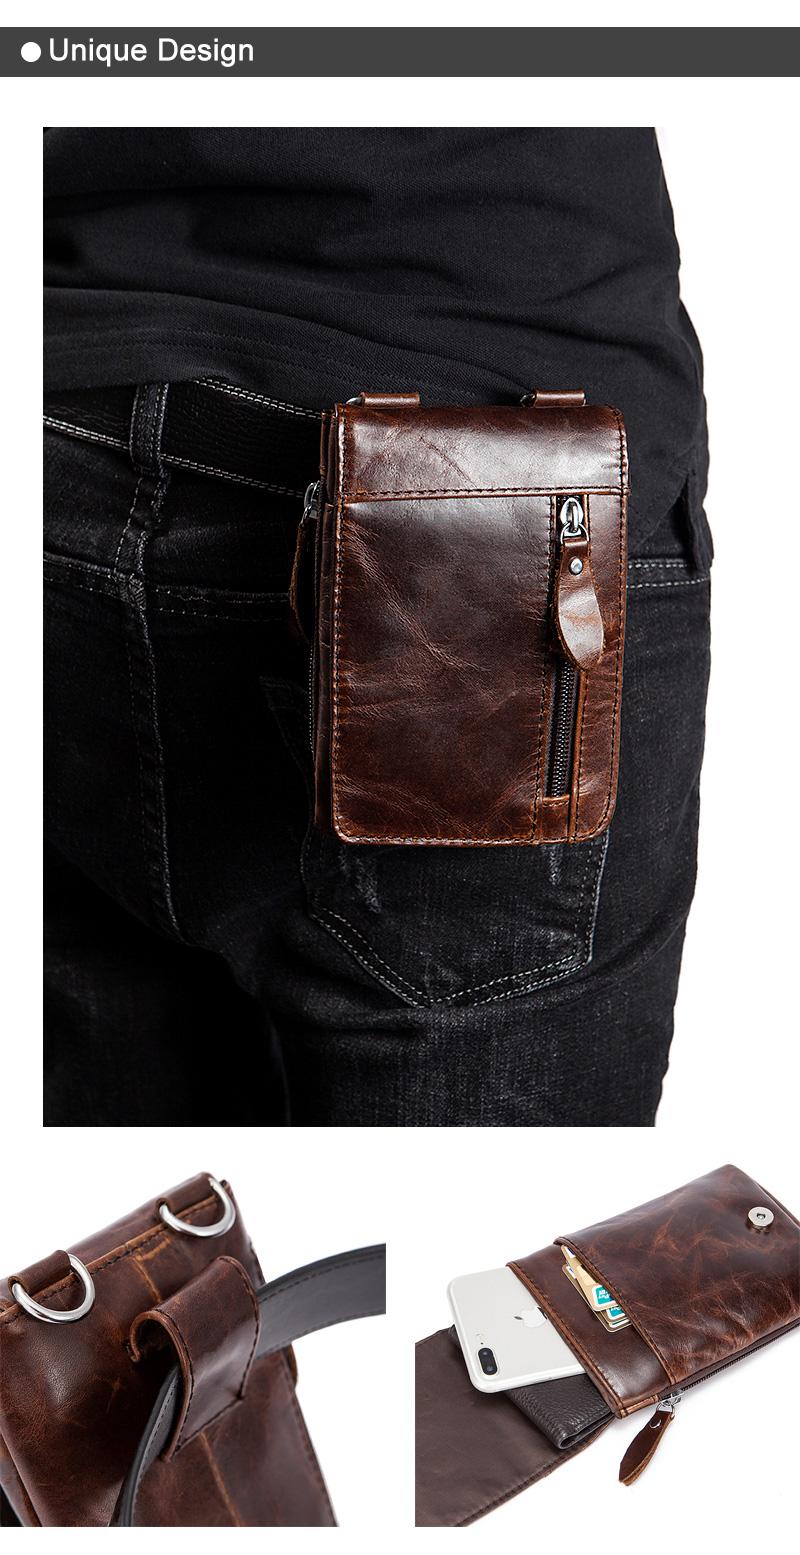 3 waist packs men hip bag